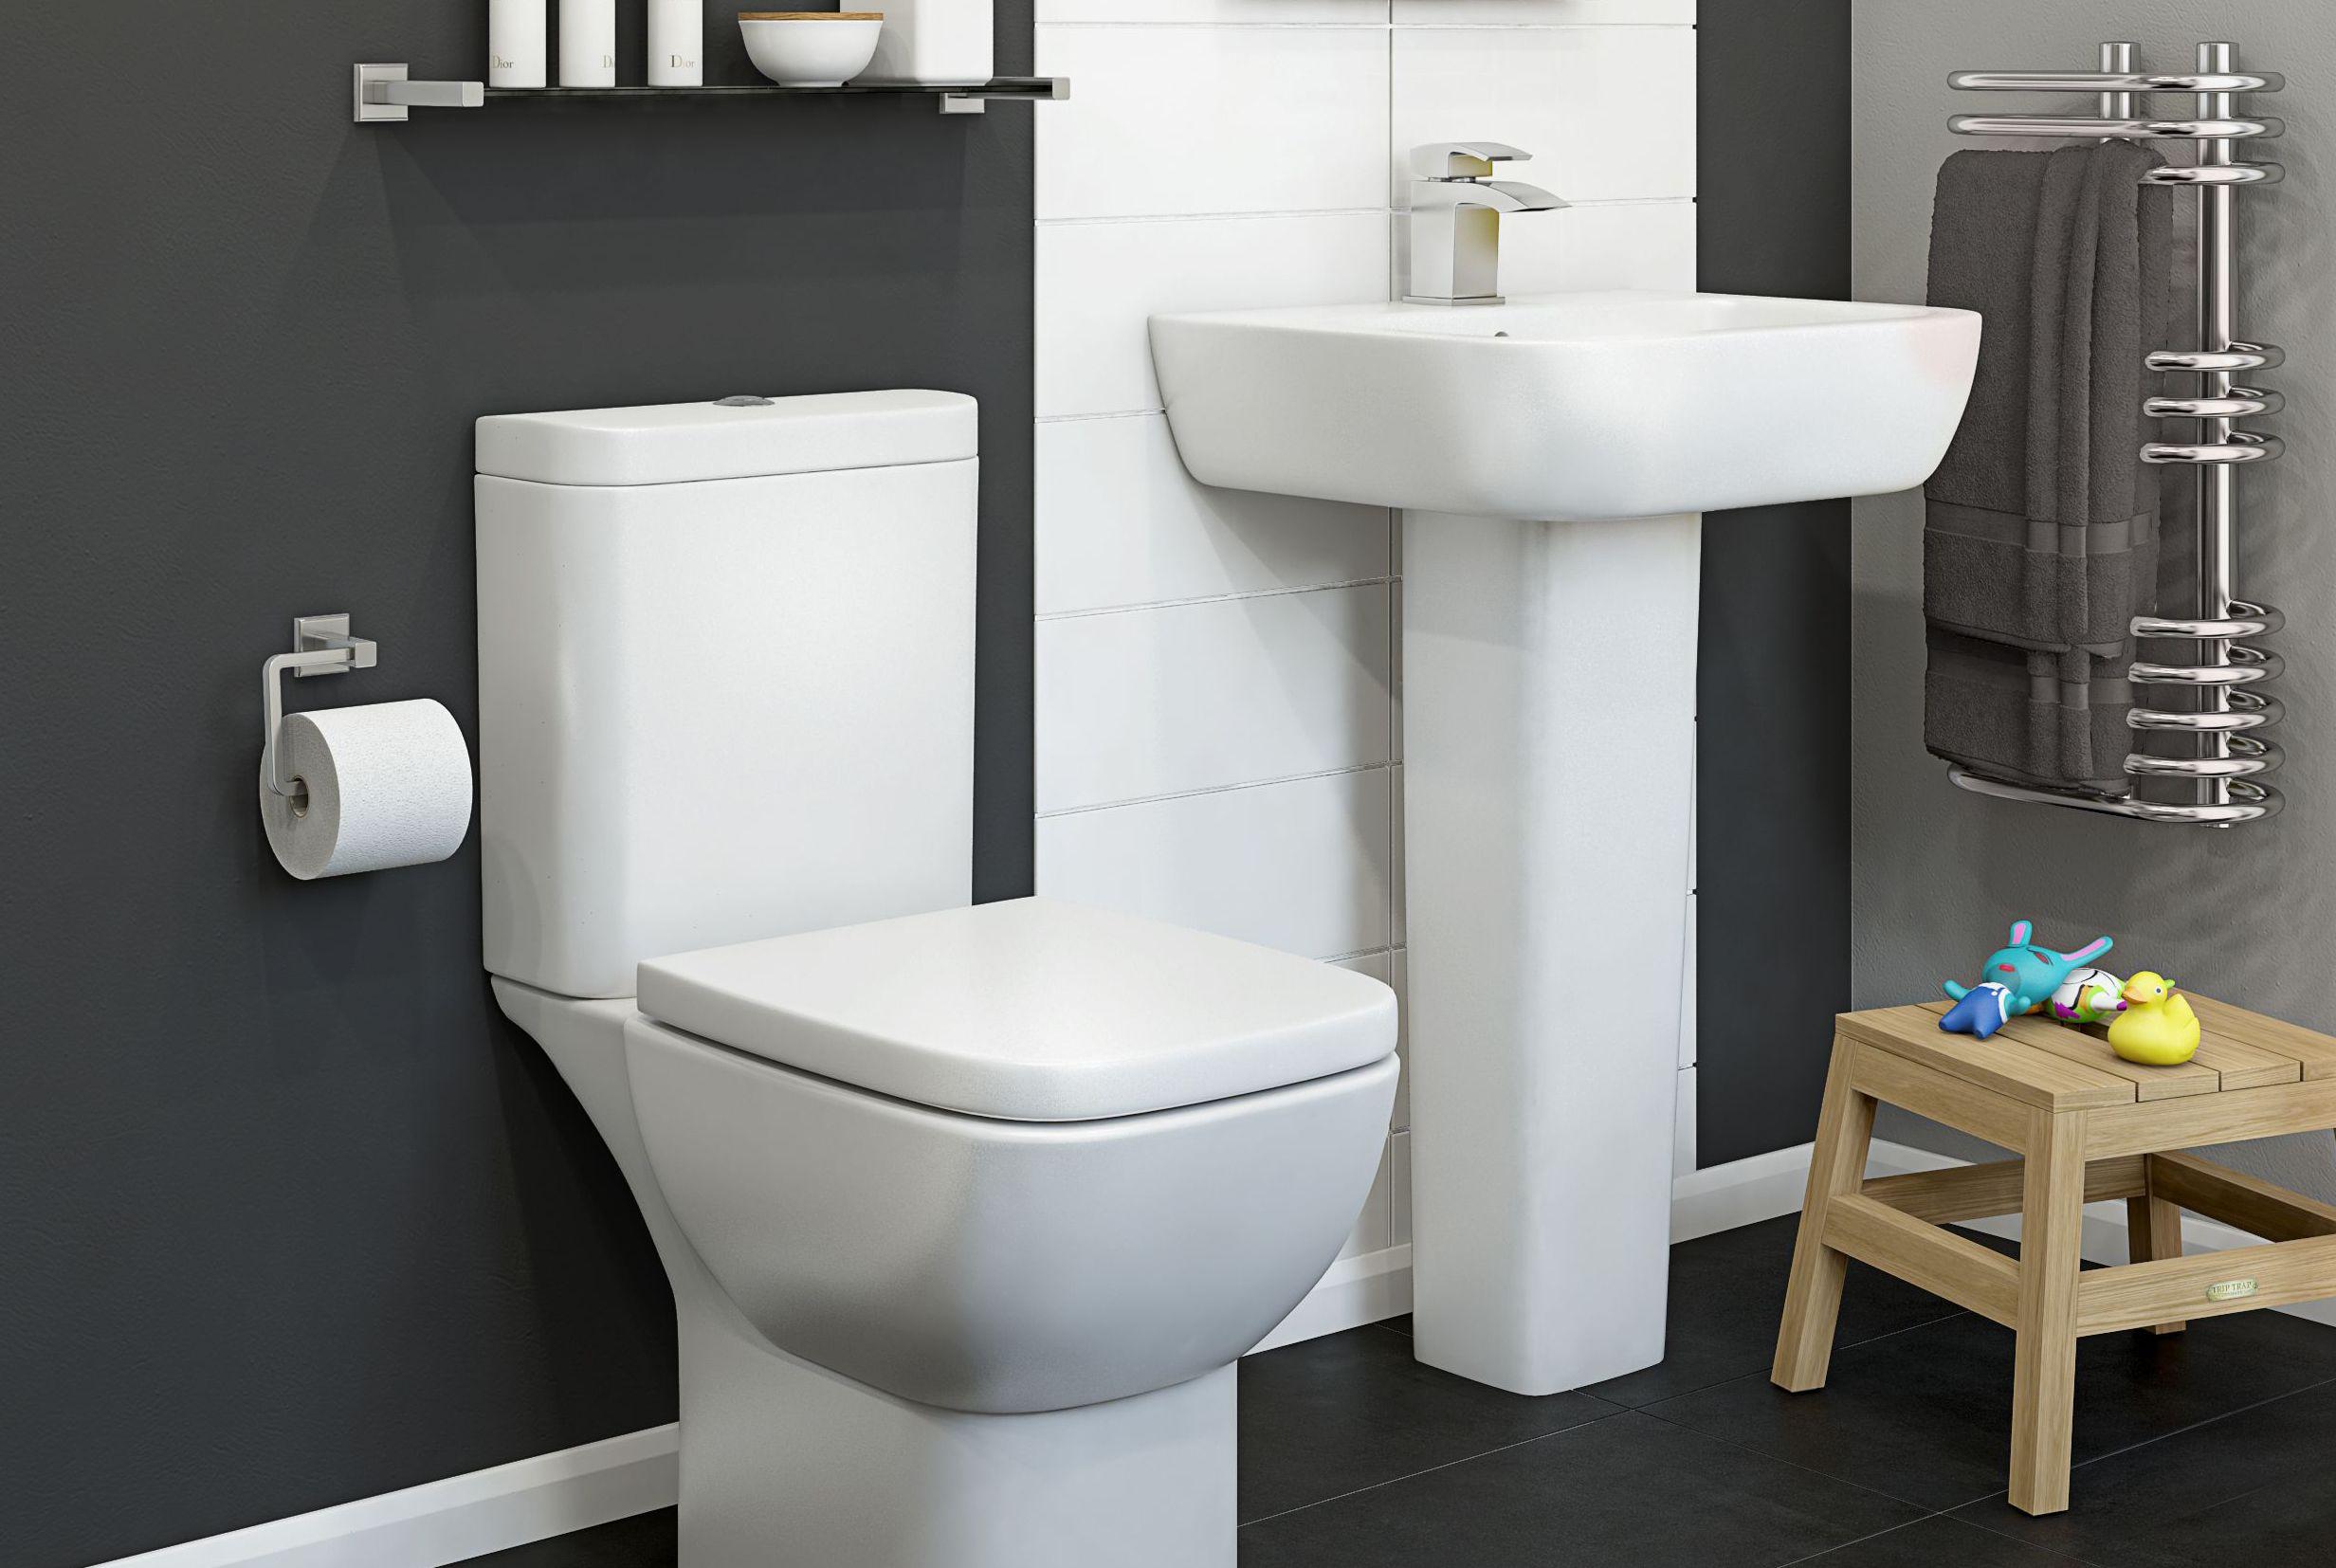 Bathroom Suites bathroom suites | complete bathroom suites | diy at b&q